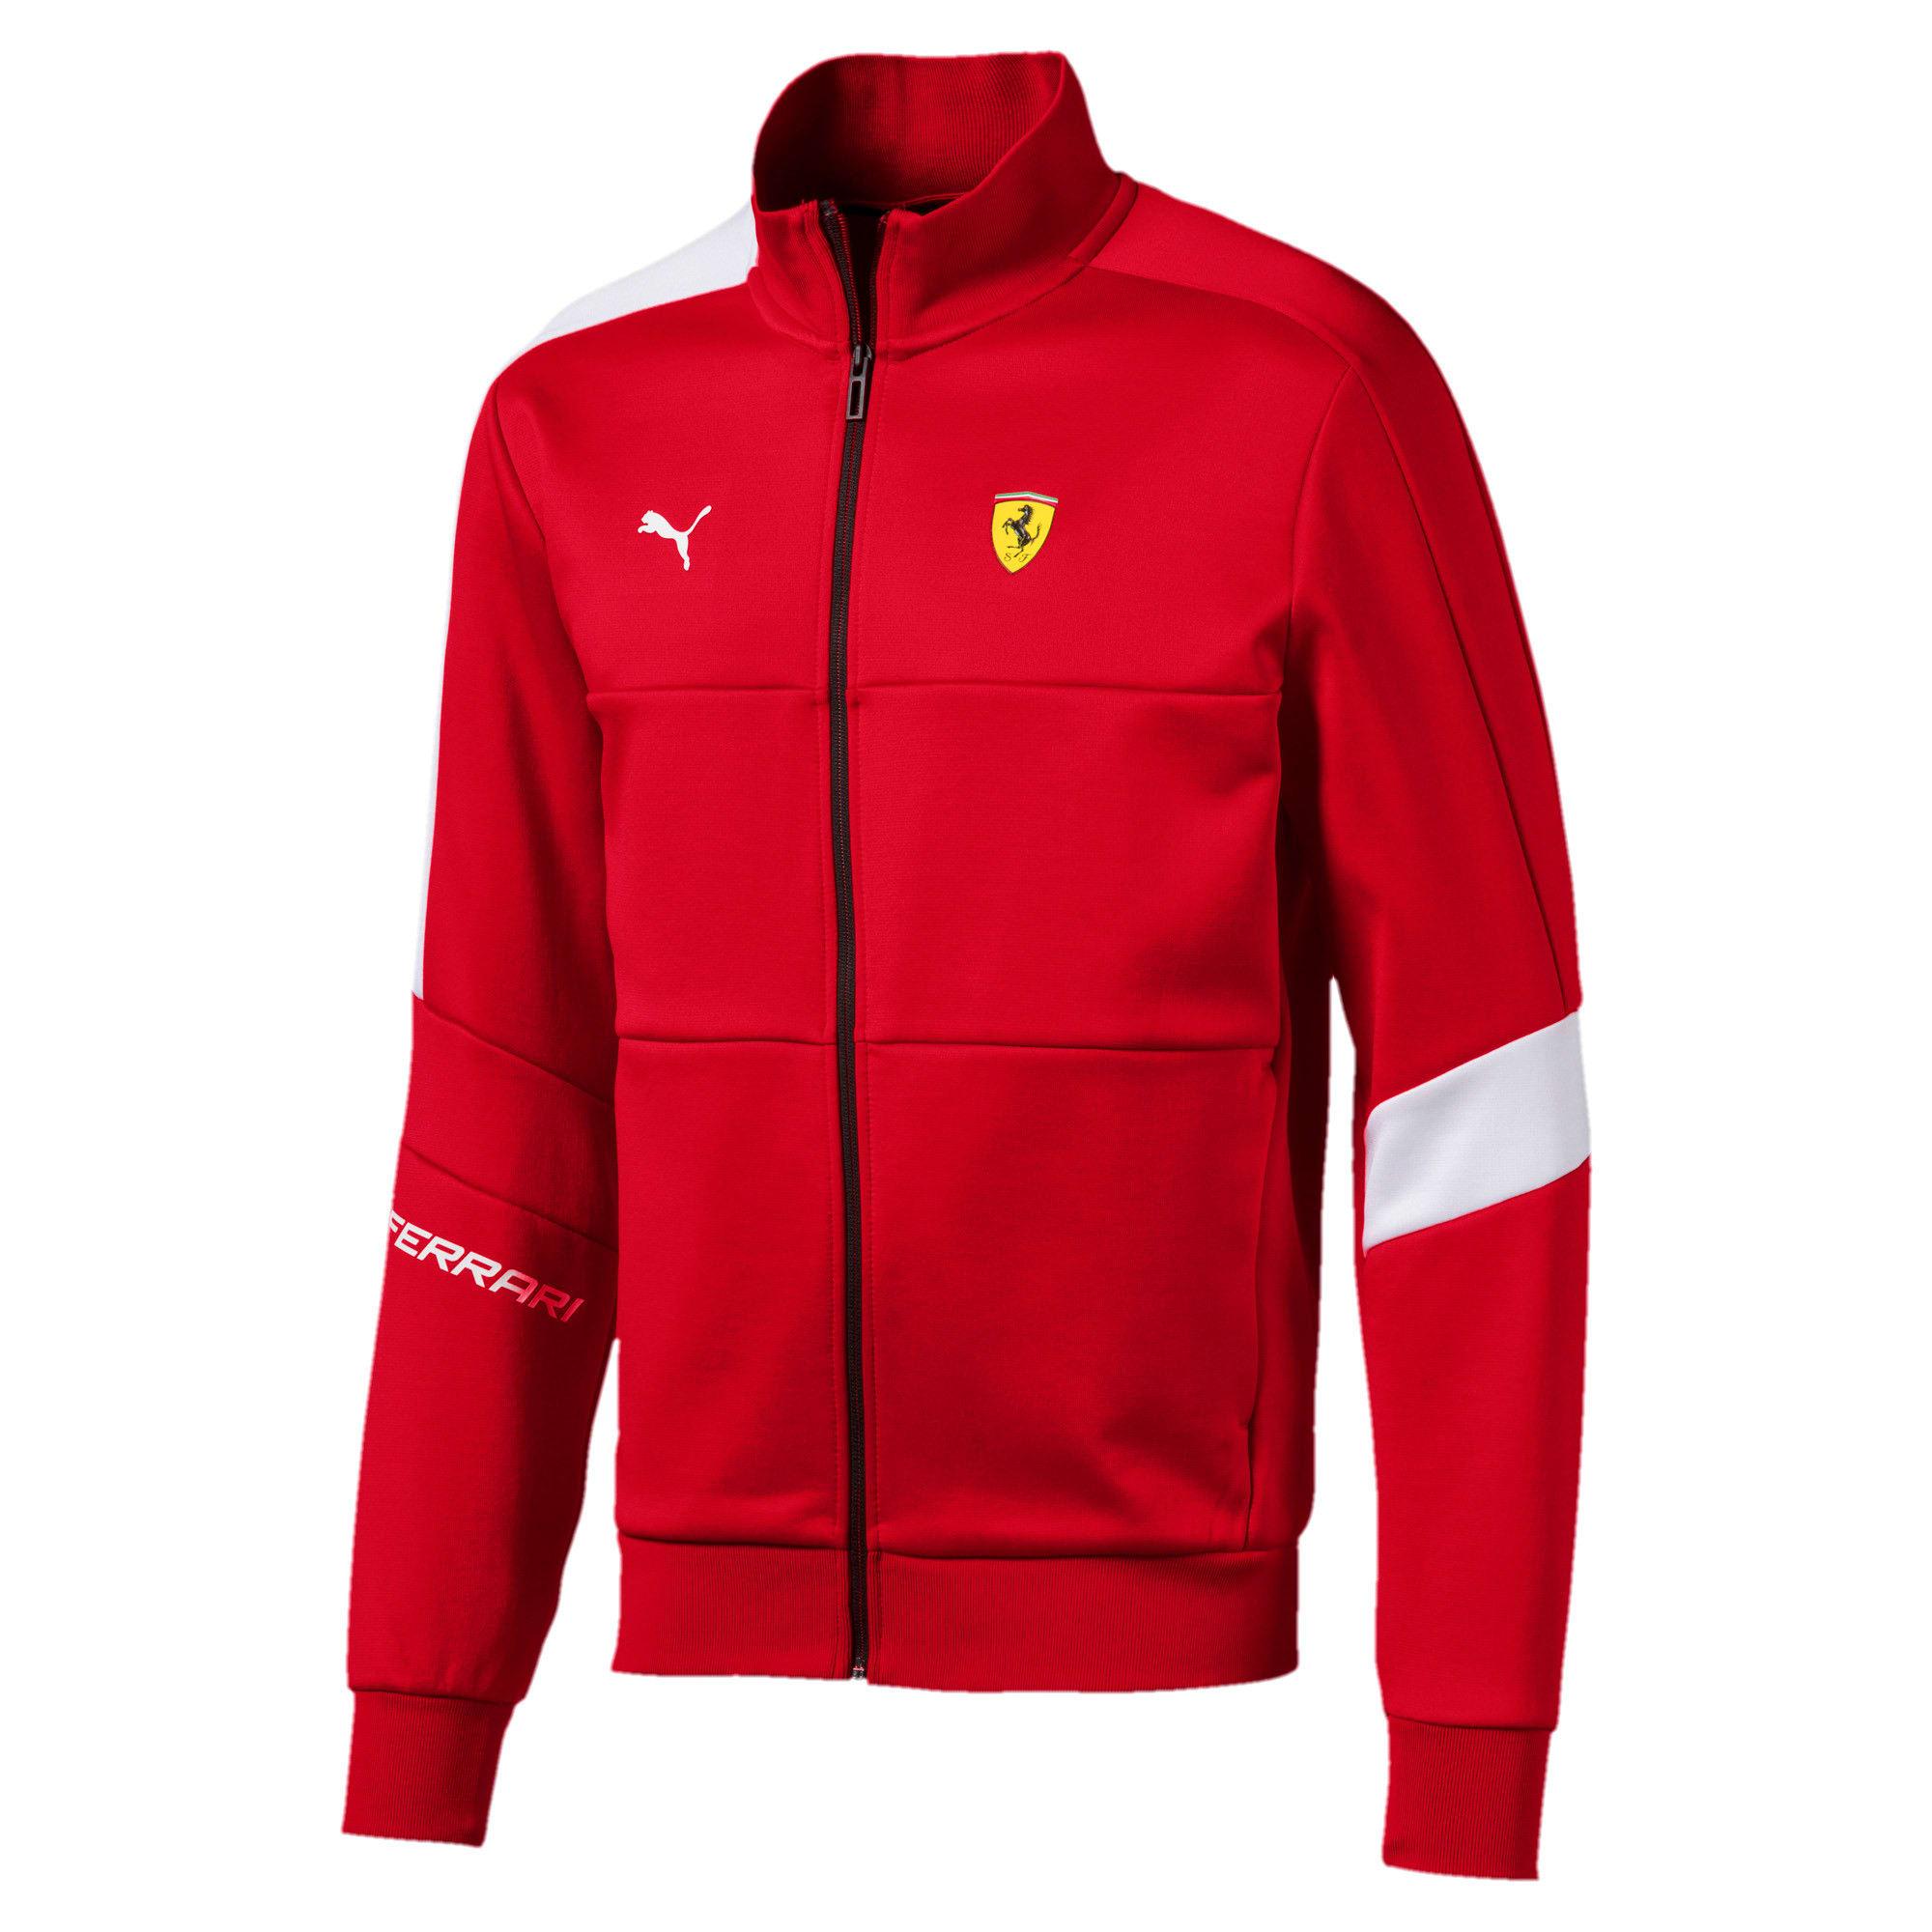 Thumbnail 4 of Ferrari T7 Men's Track Jacket, Rosso Corsa, medium